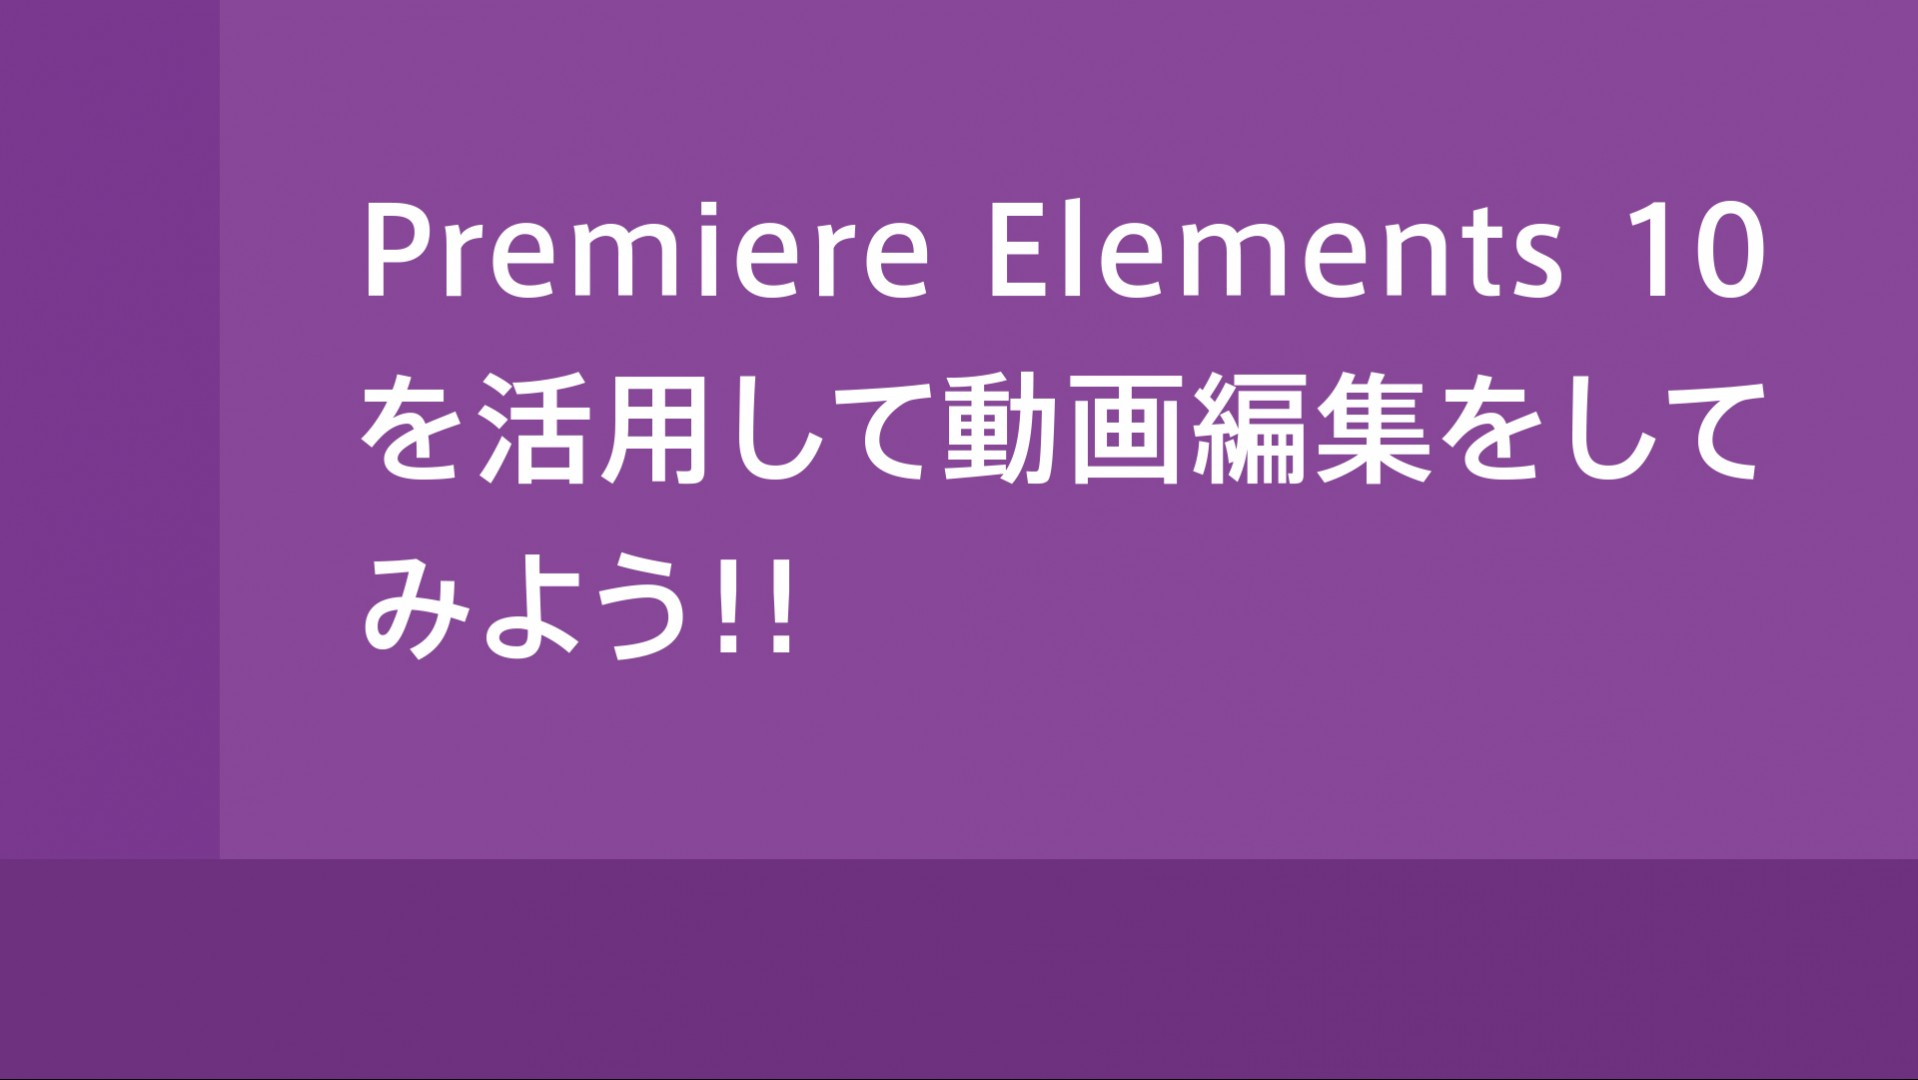 Premiere Elements 10 フェードアウトの設定